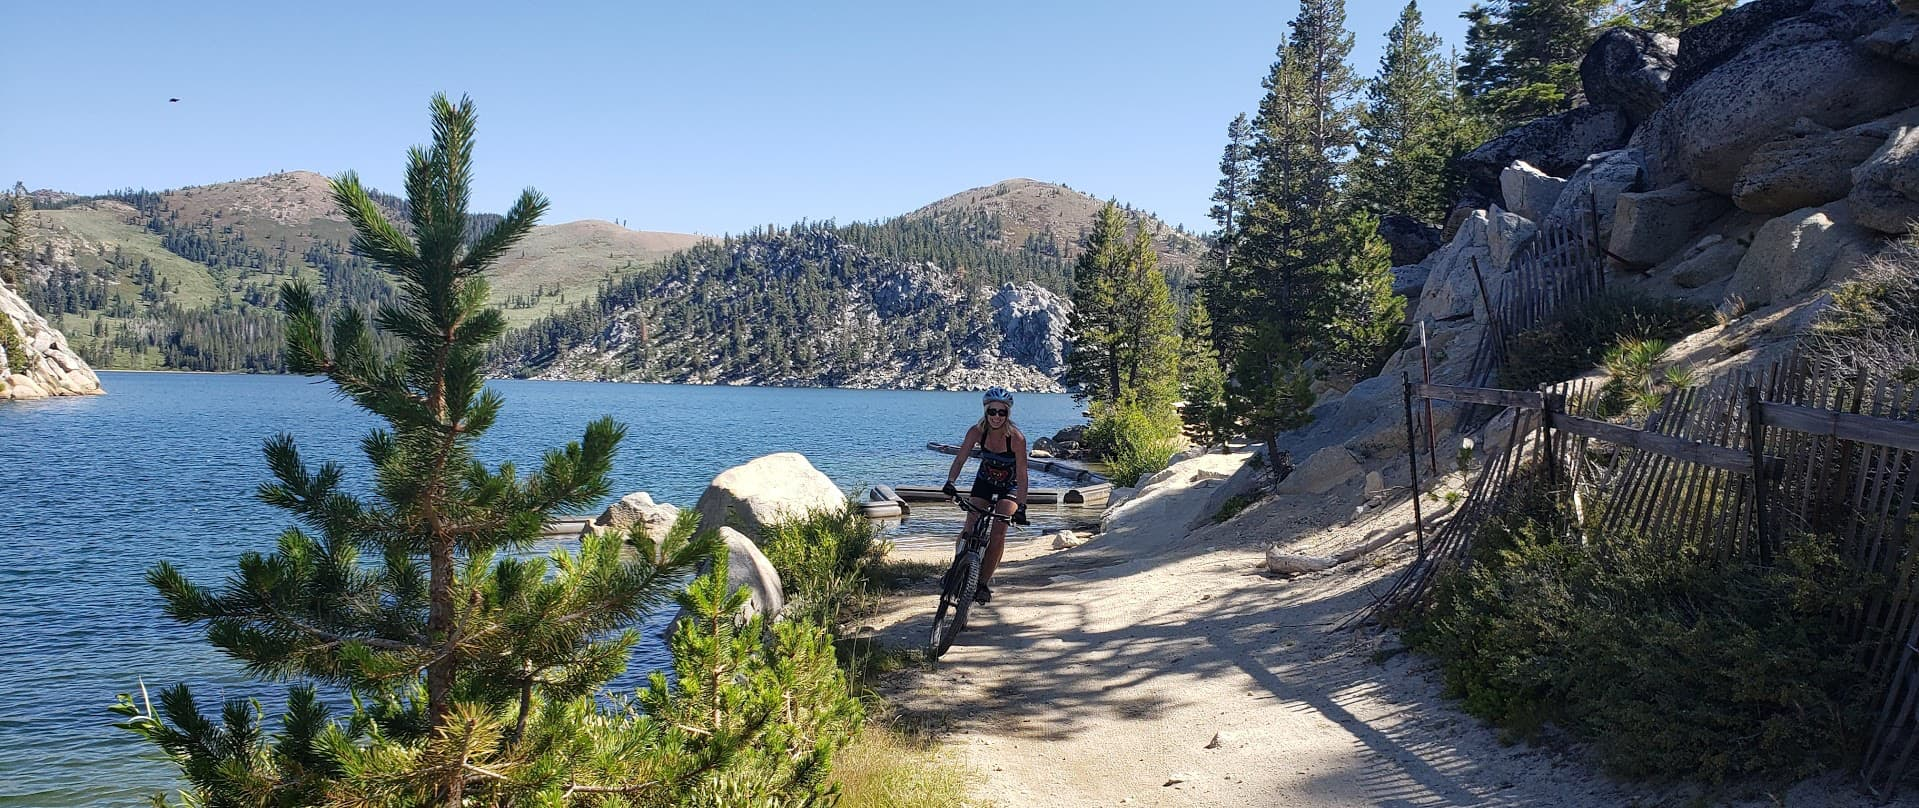 Lake Tahoe, skull, human remains